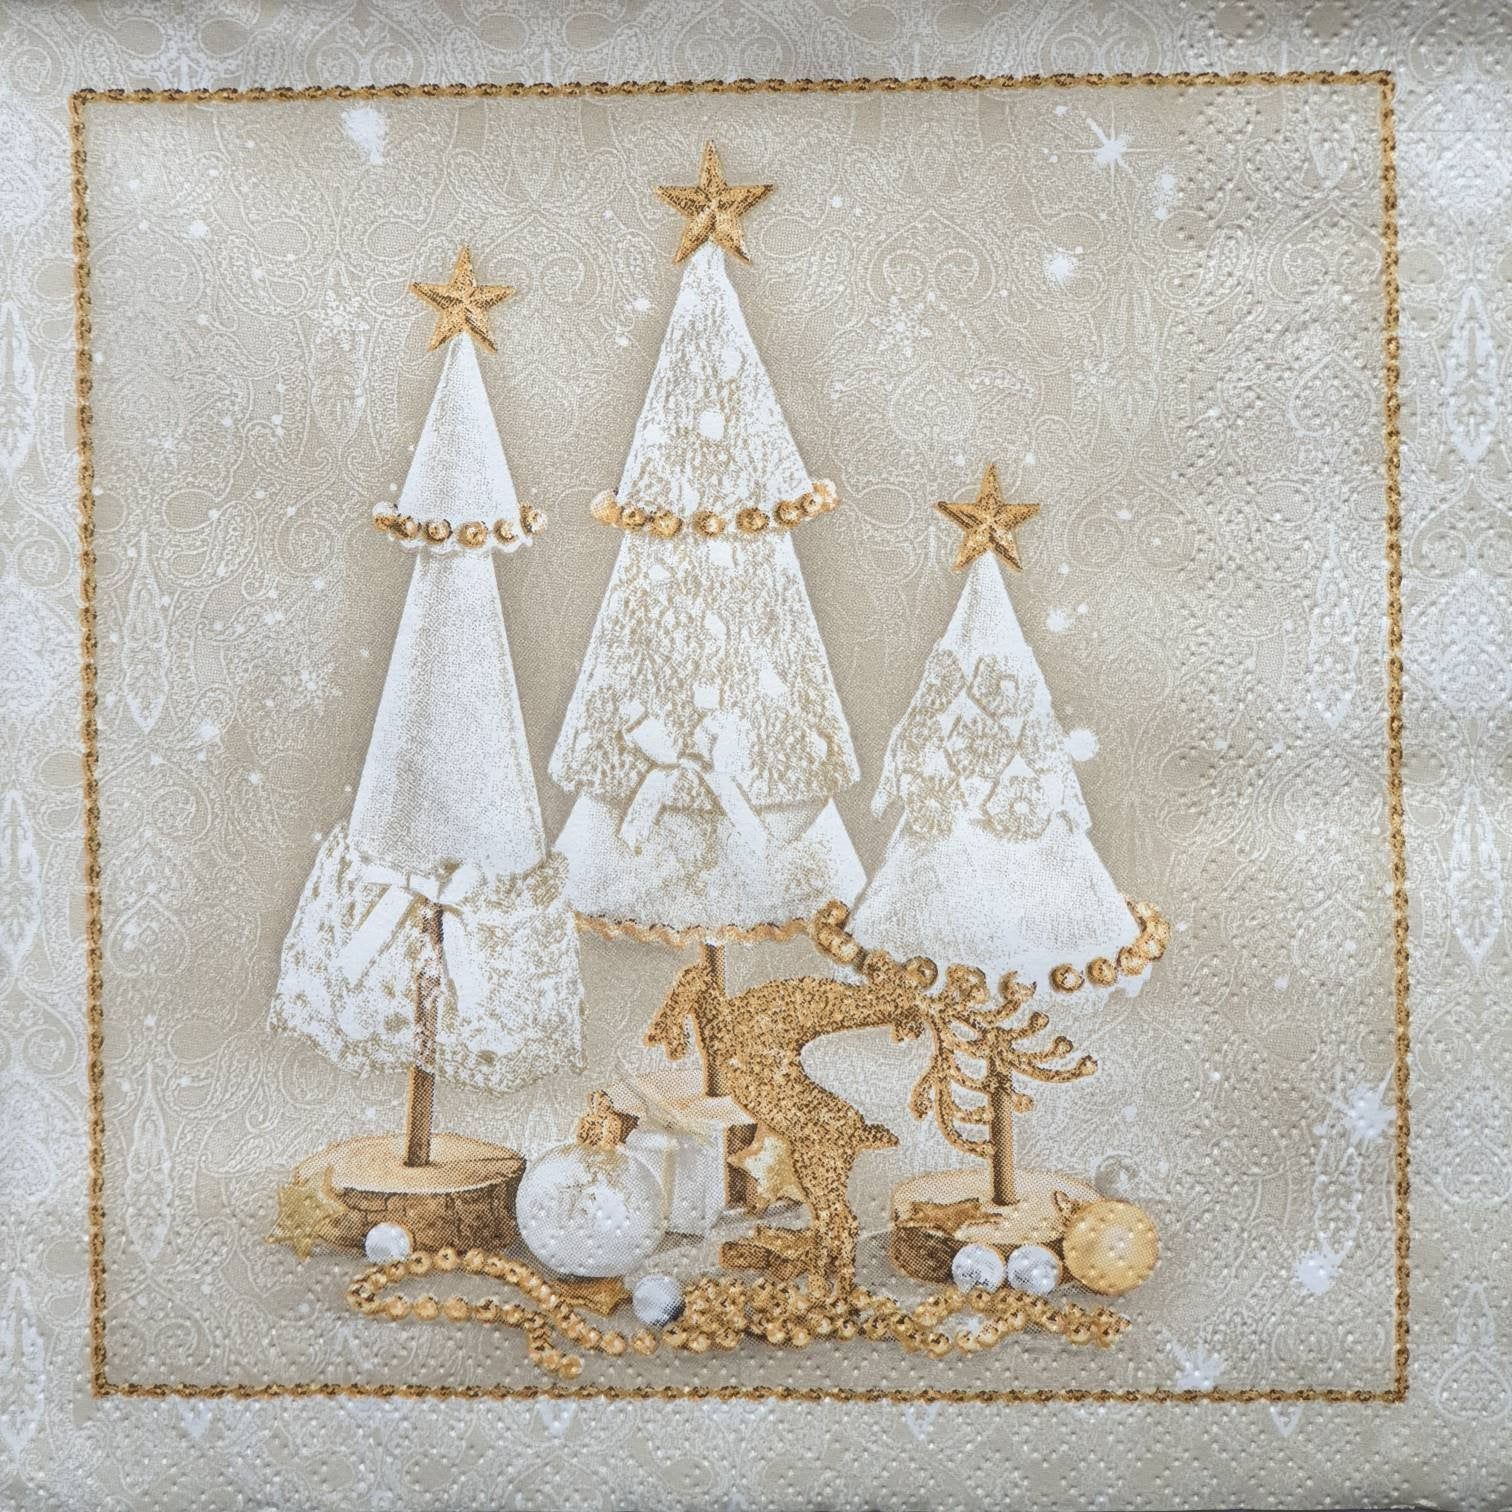 4 Decoupage PAPER NAPKINS SERVIETTES CHRISTMAS TREE 13 Inch Craft Supplies NEW